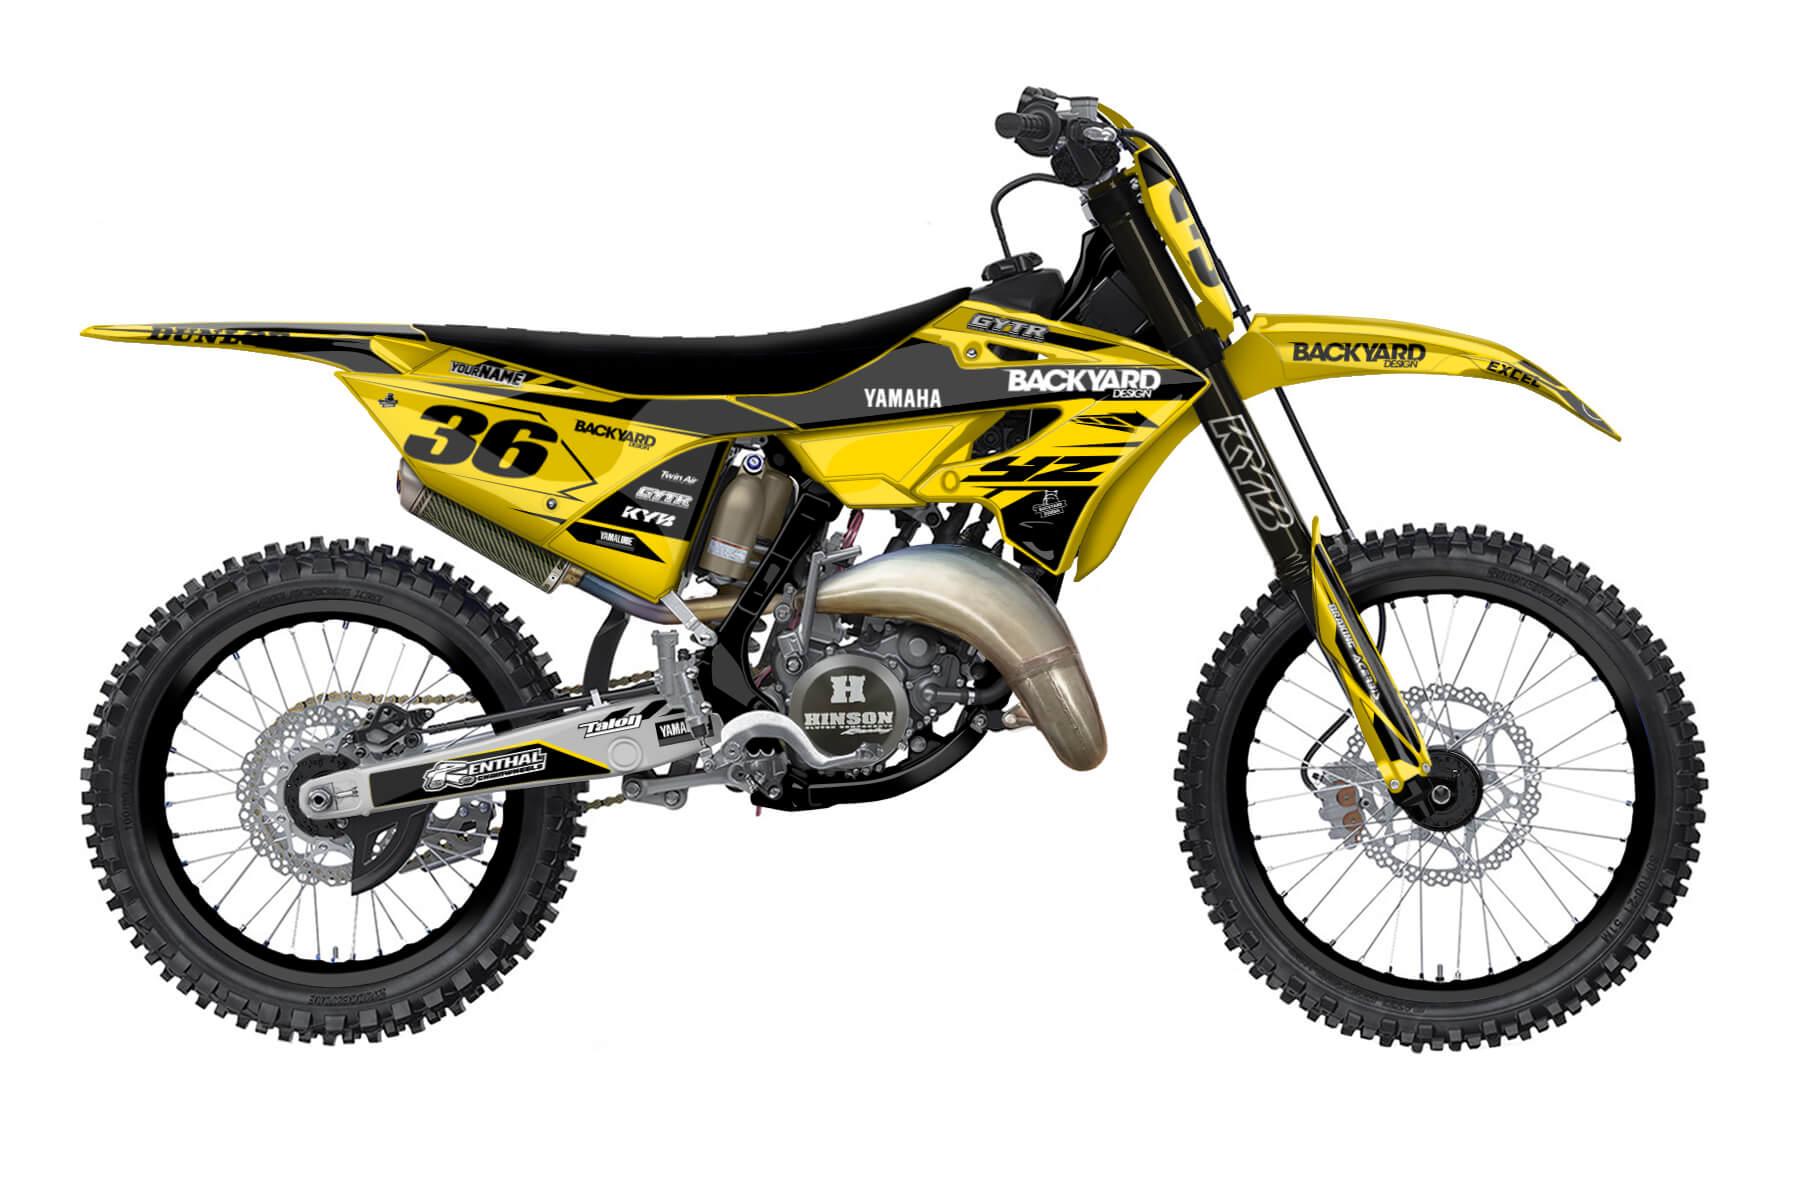 Yamaha YZ 250 - 2022 - Backyard Design - Mx Dekor - Division Flow